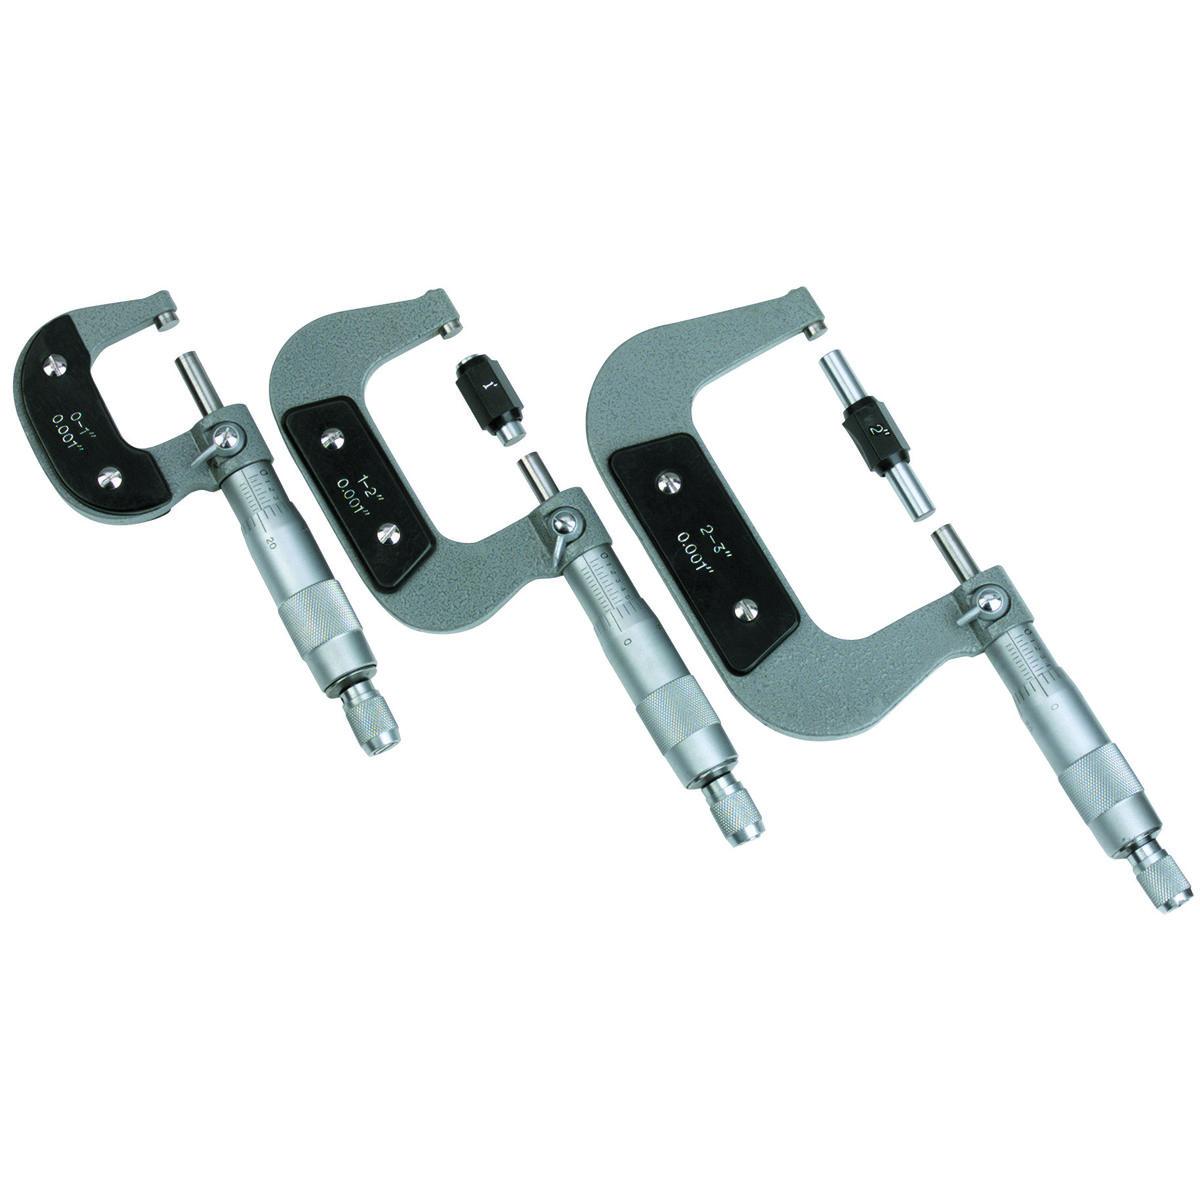 Micrometer Pvc storage, Best portable air compressor, Tools